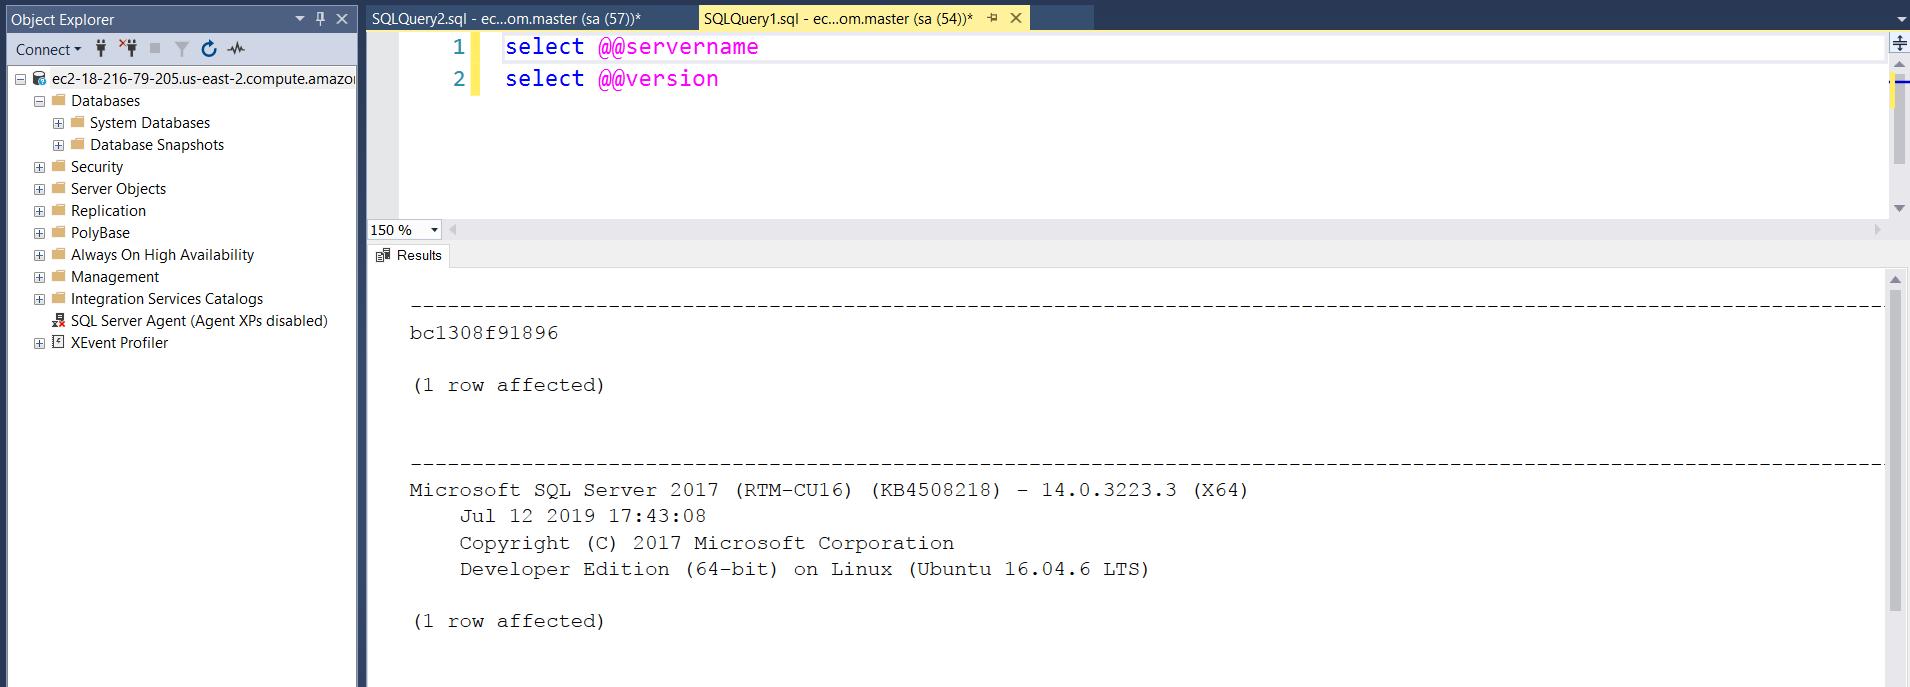 Logging on Using SSMS